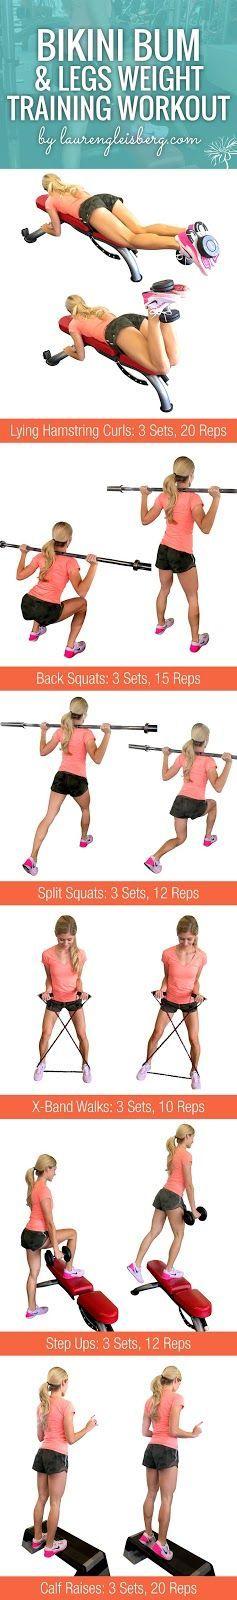 Bikini & Legs Training Workout